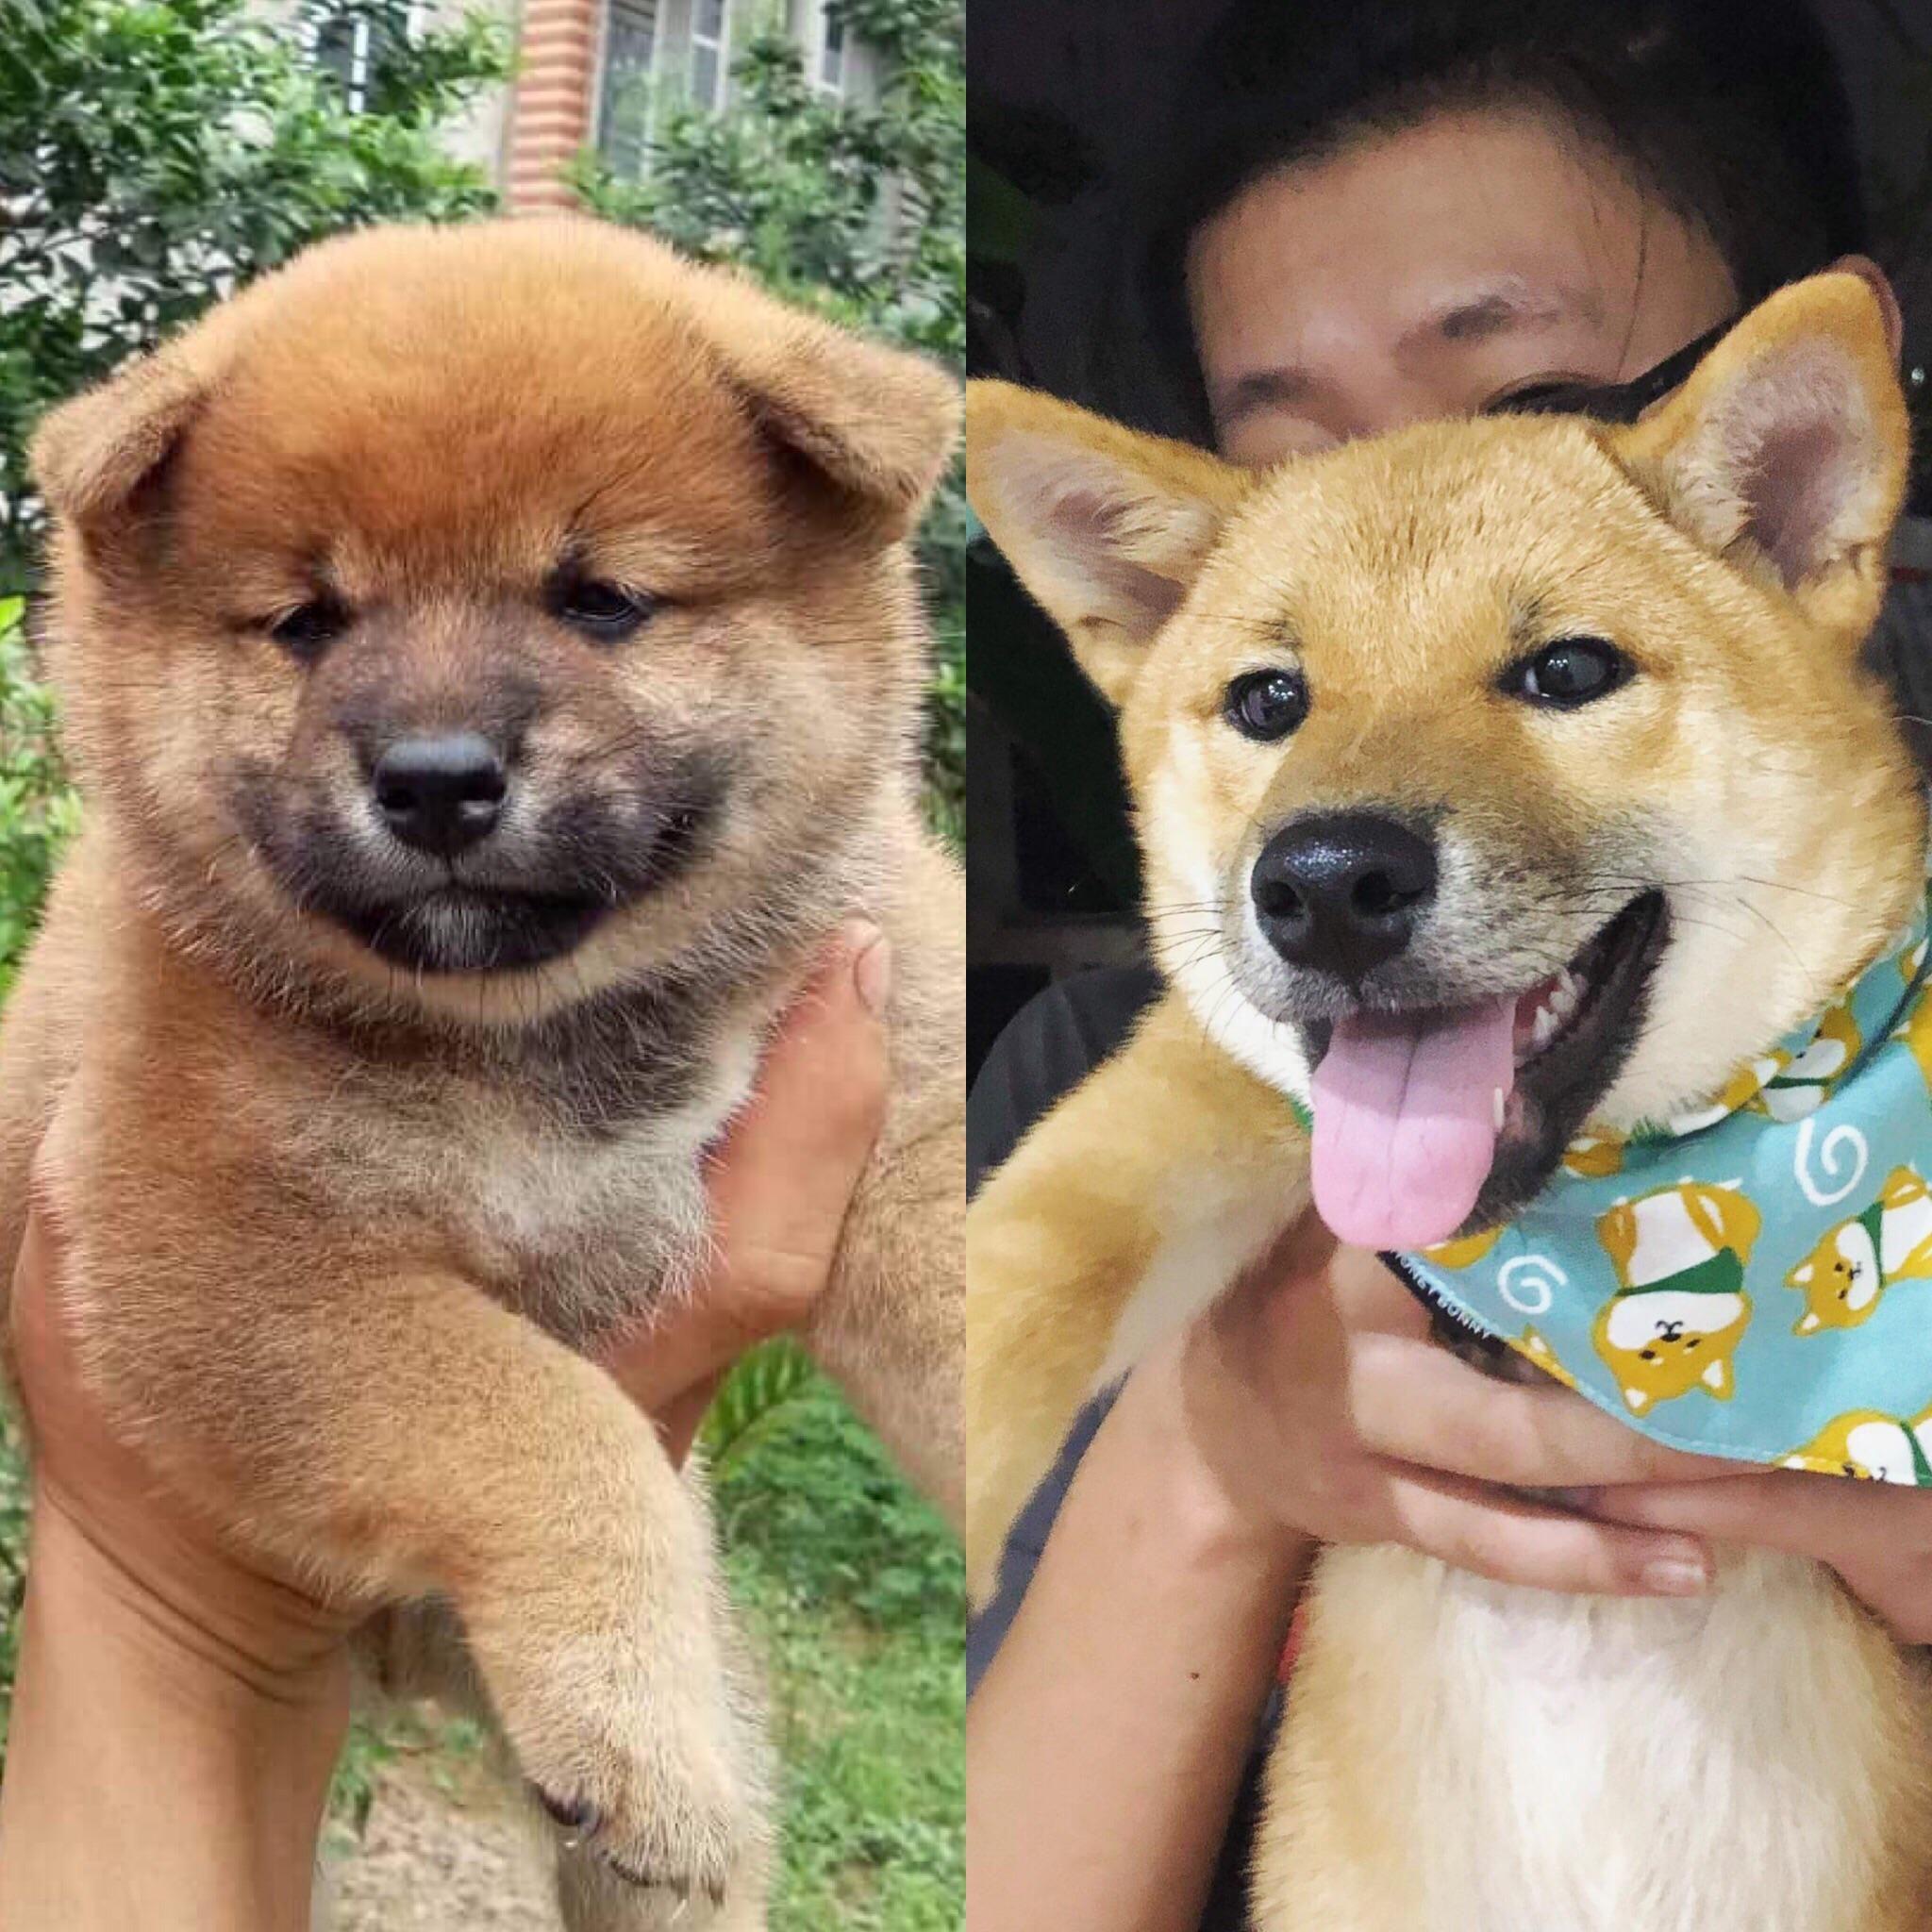 2 Weeks Vs 7 Months Shibainu Shibainupuppies Akita Puppies Shiba Inu Shiba Inu Puppy